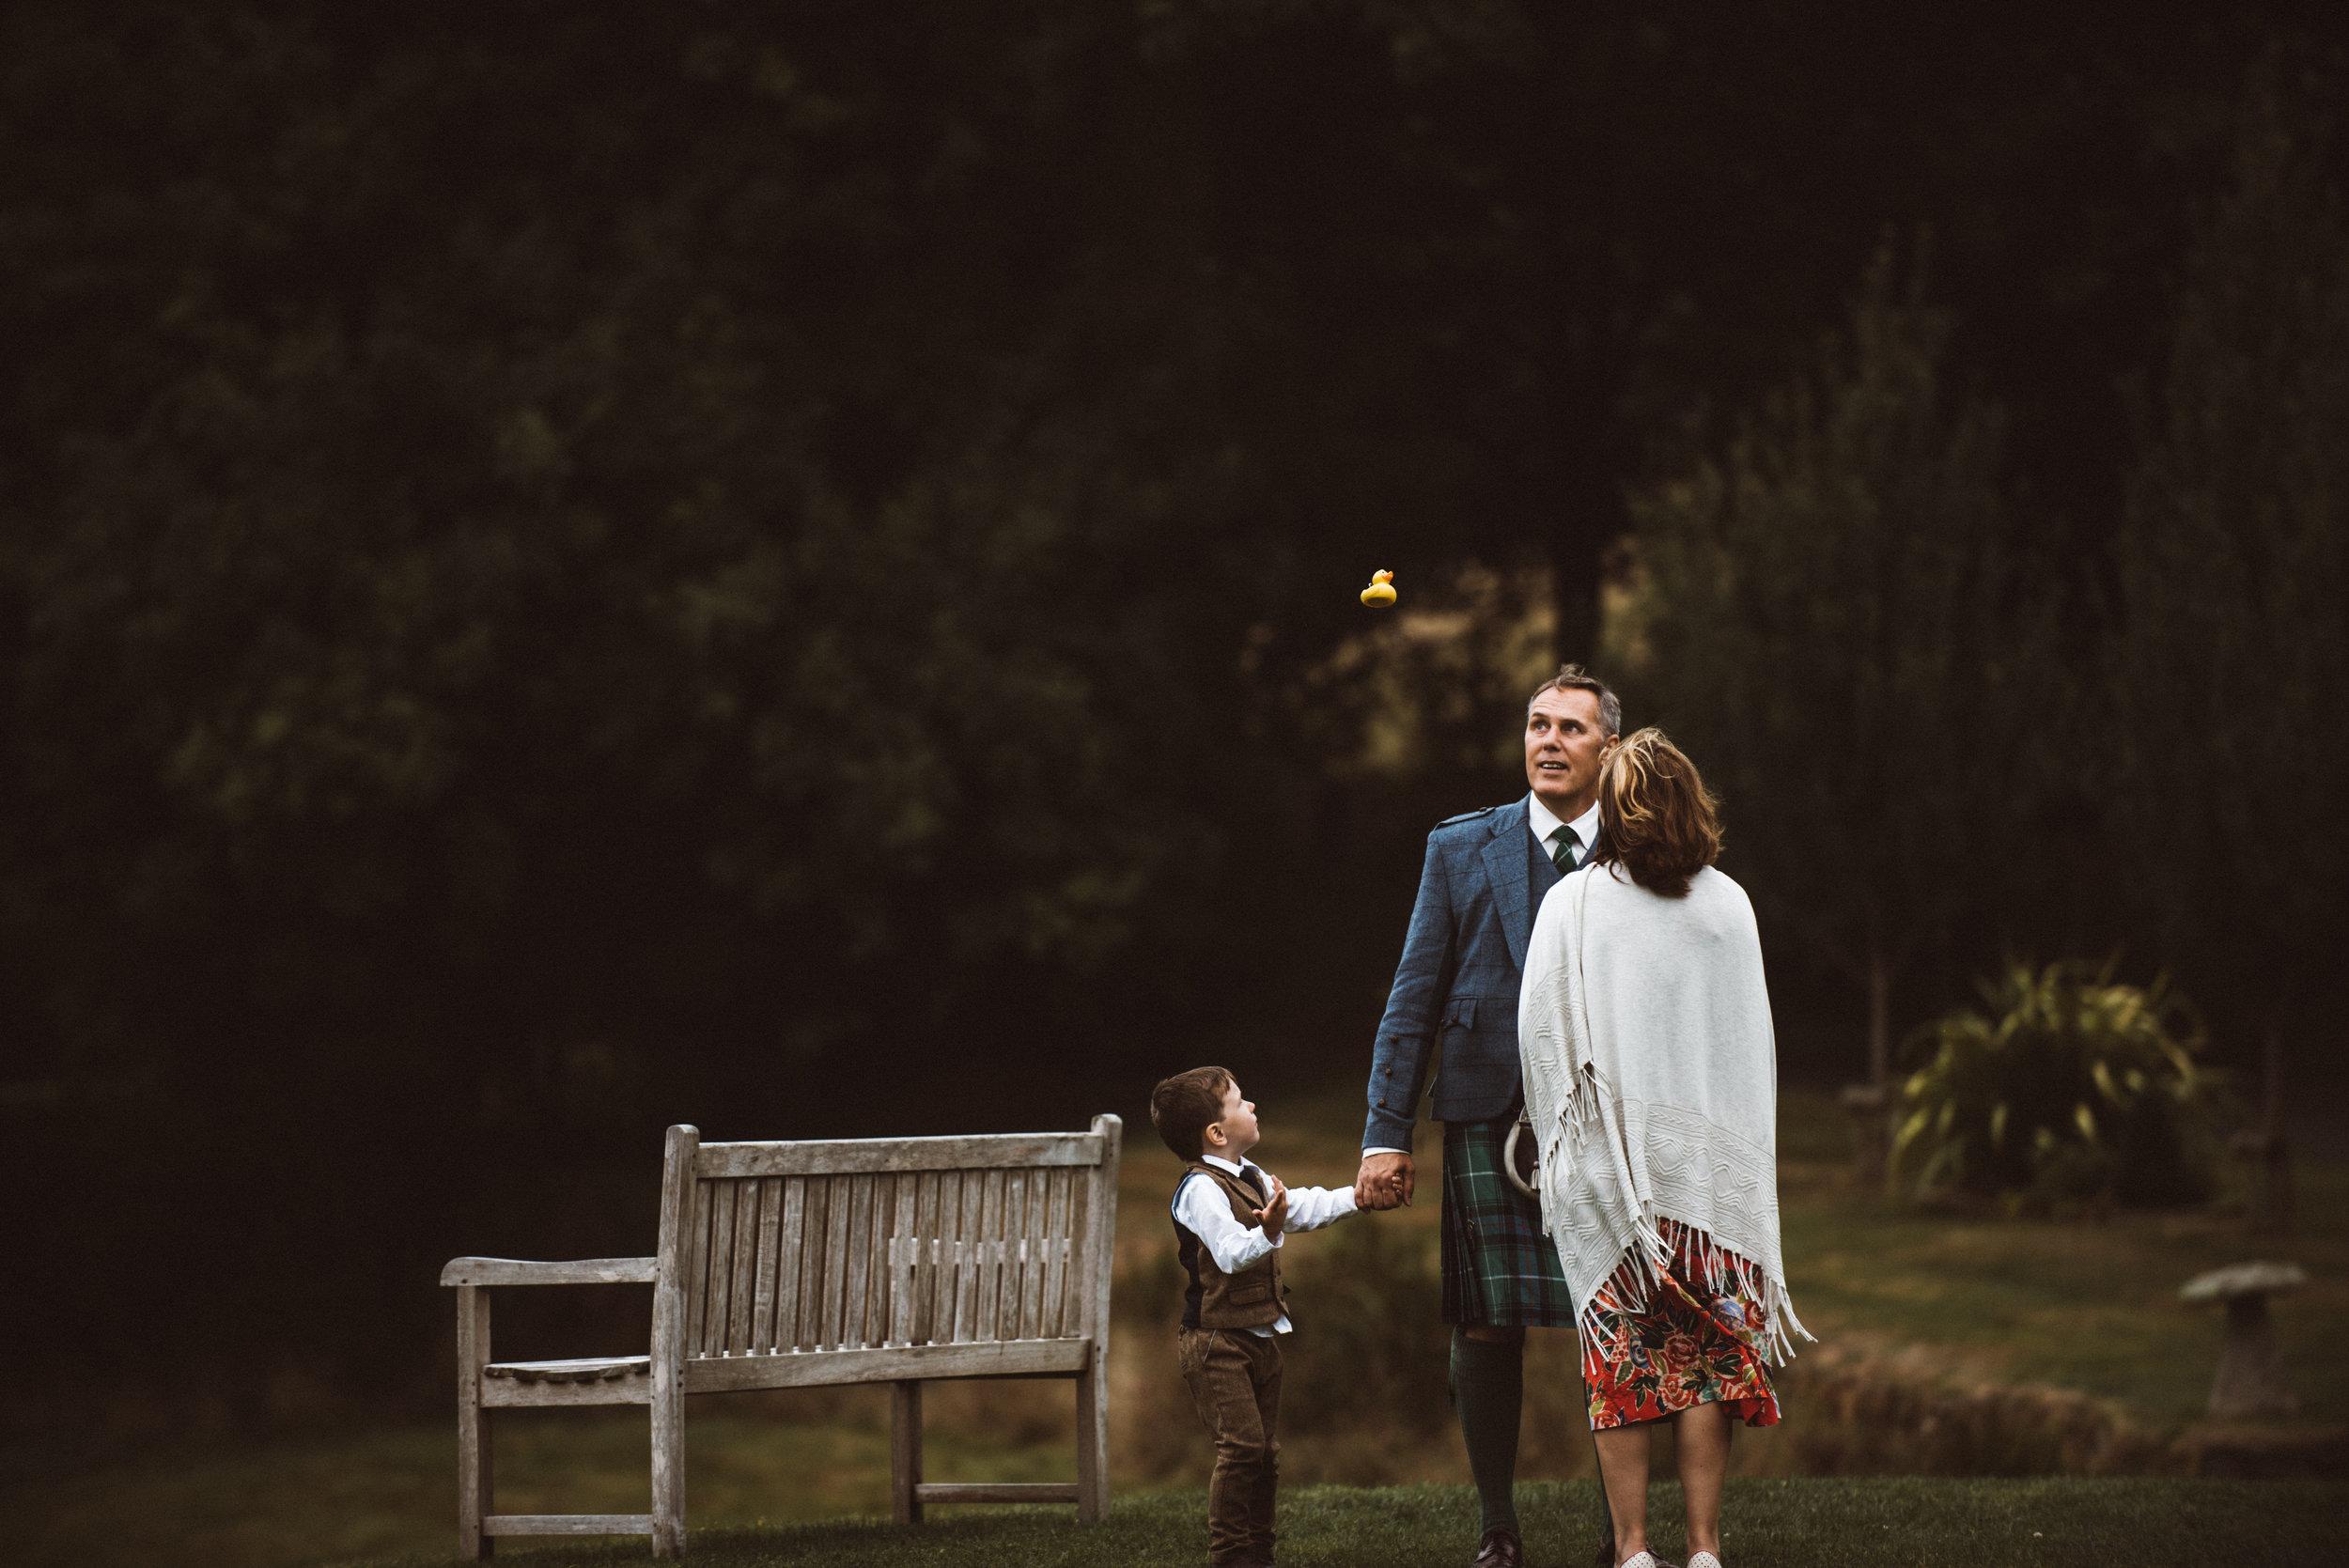 pengenna-manor-wedding-photographer-53.jpg